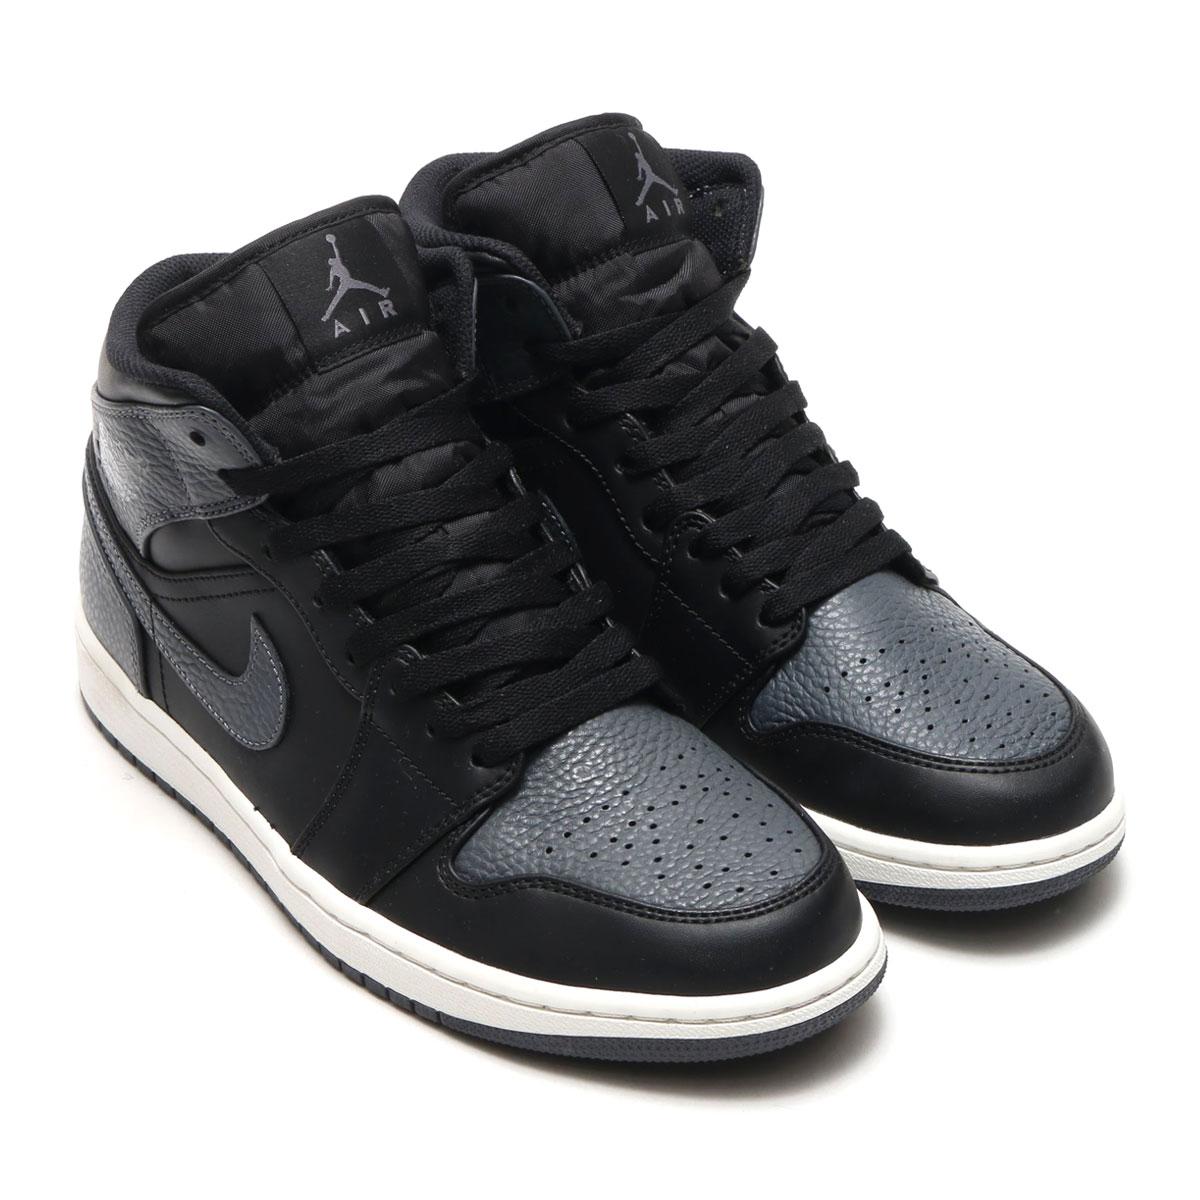 51e326e041d MID cut version of Air Jordan 1 who it was first sig nature shoes of Michael  Jordan